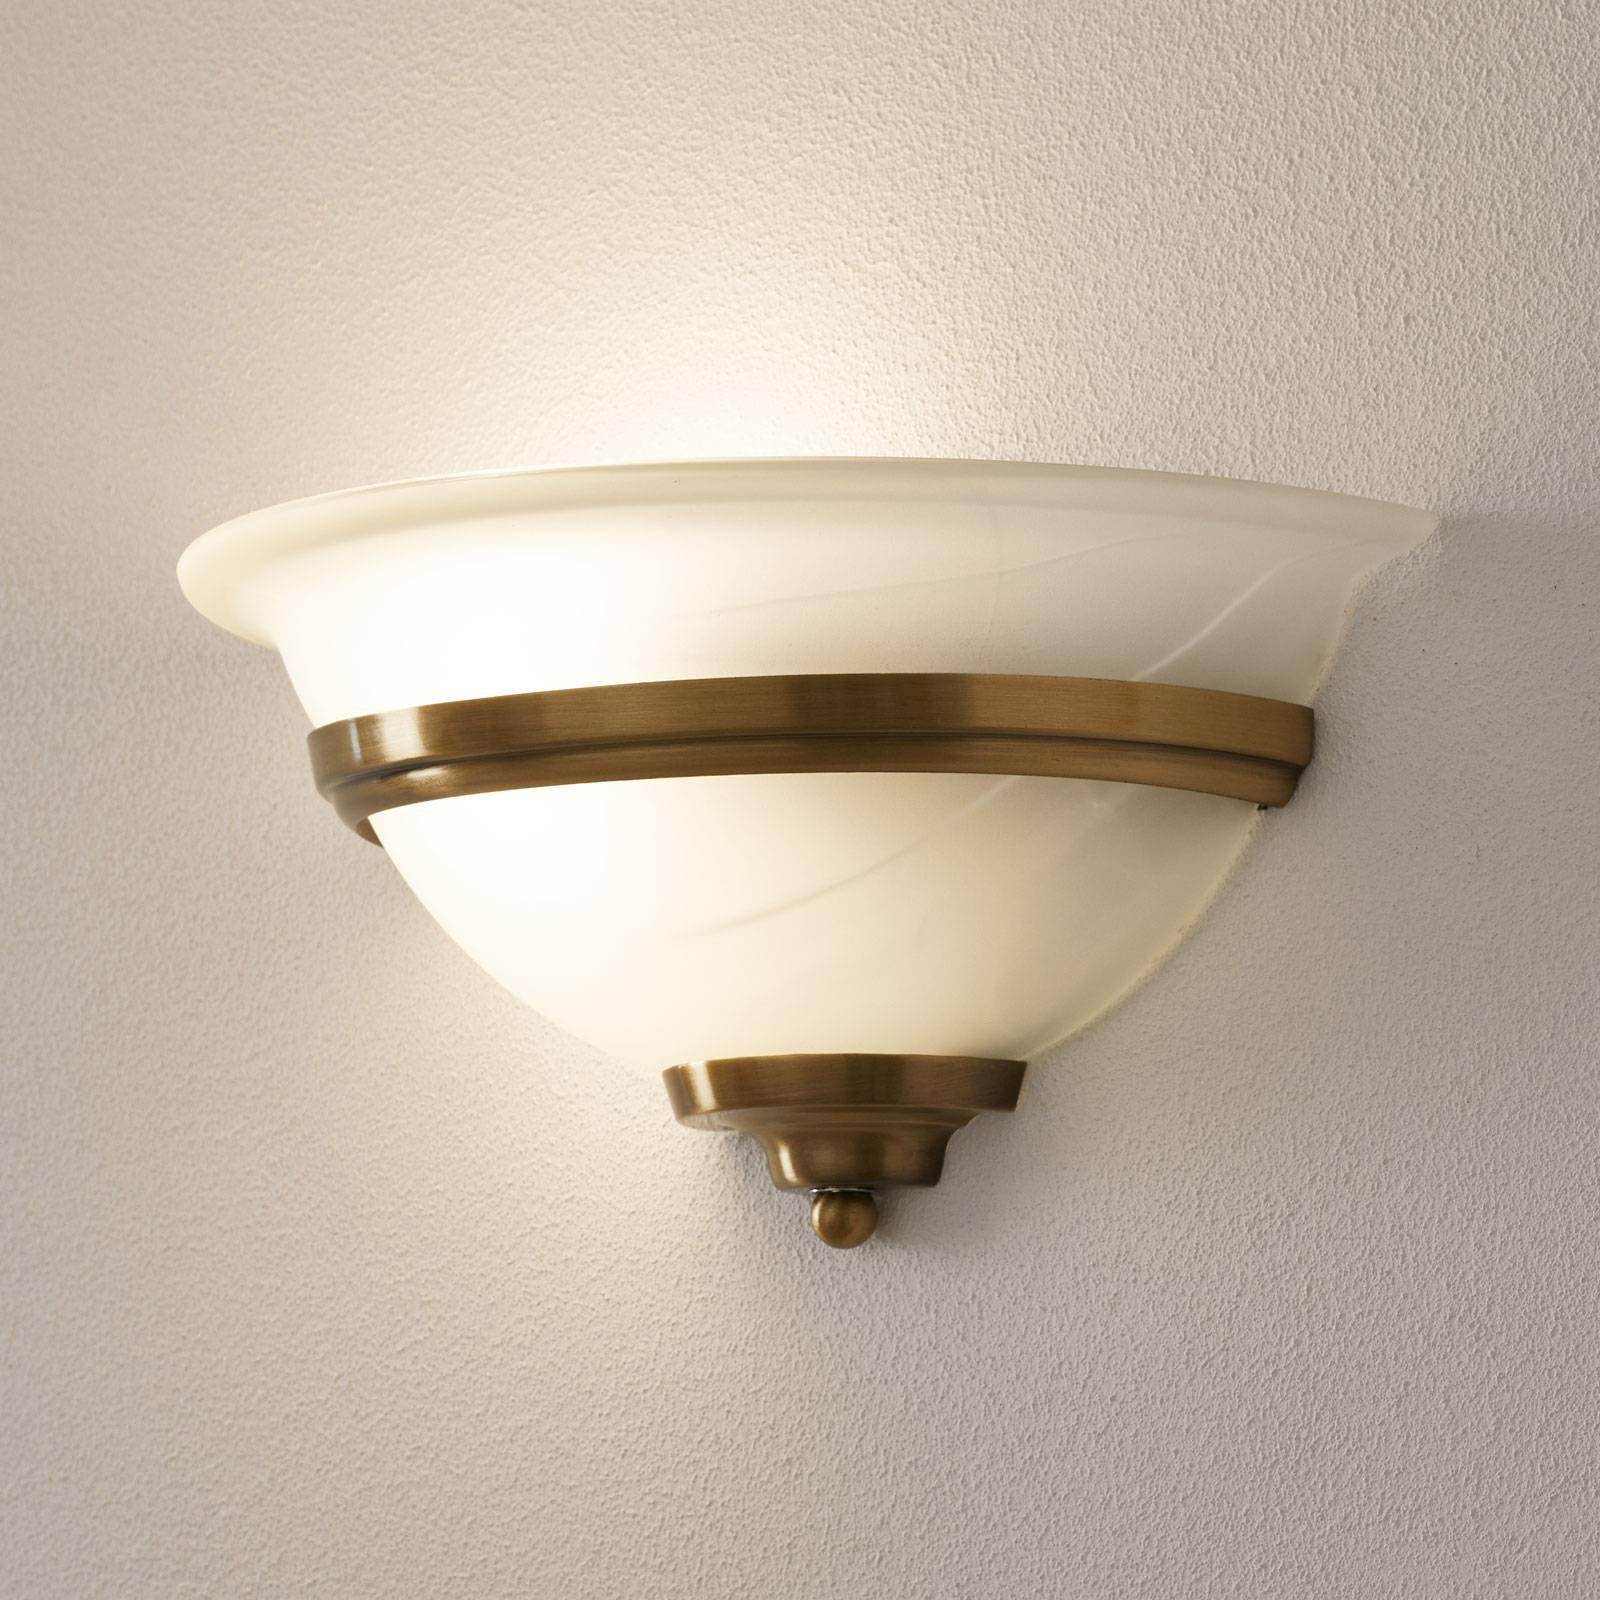 Storartet LED vegglampe TOLEDO